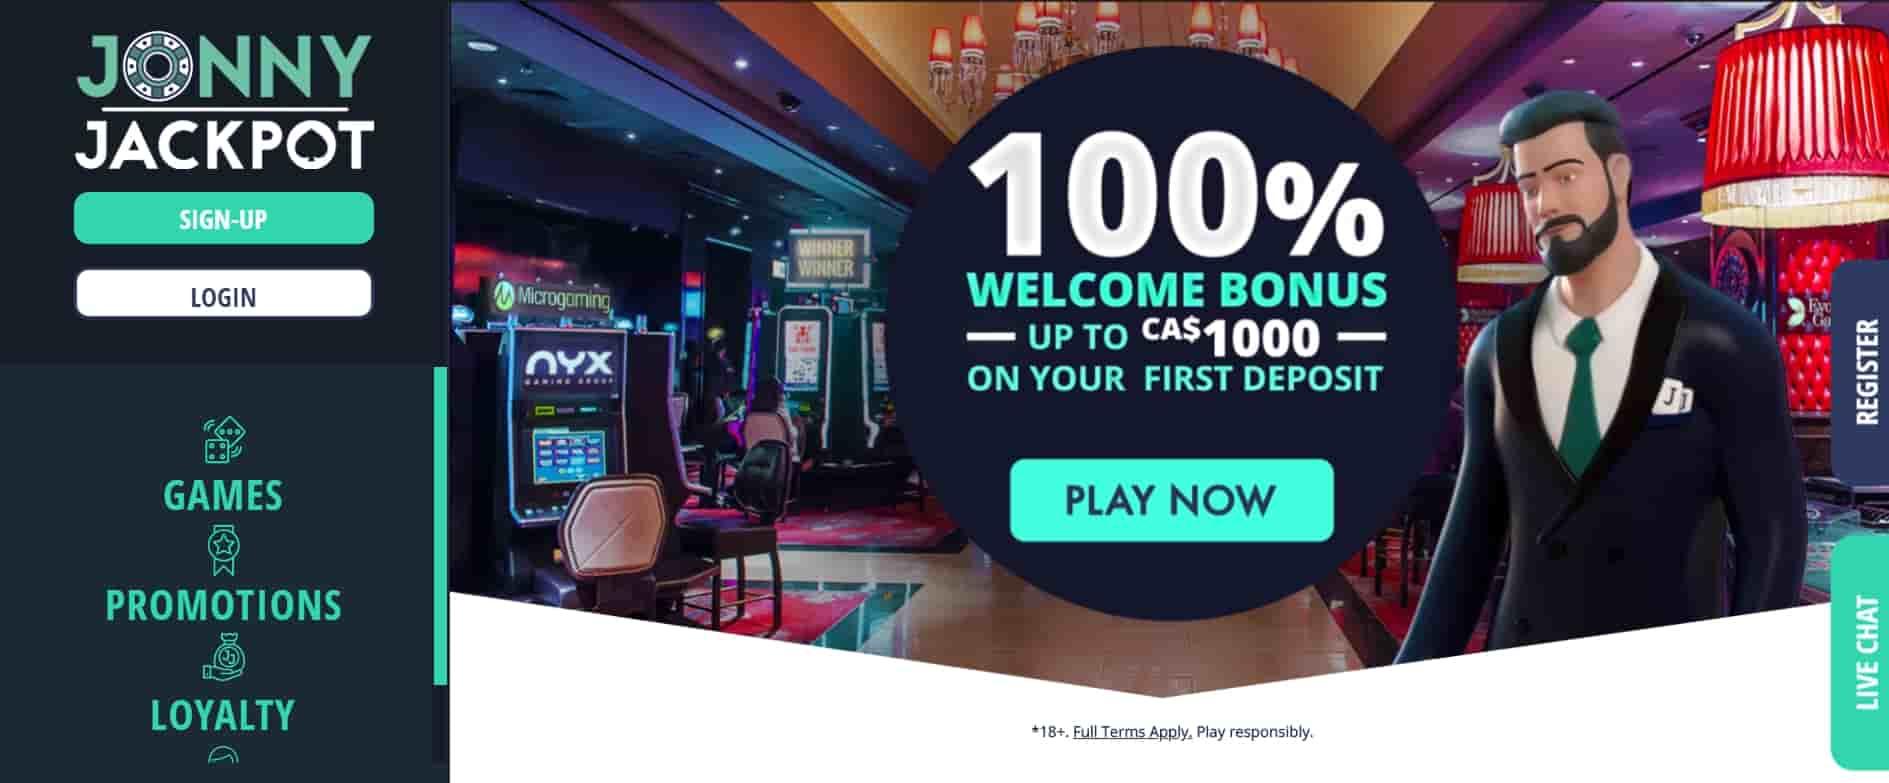 Jonny Jackpot Online Casino